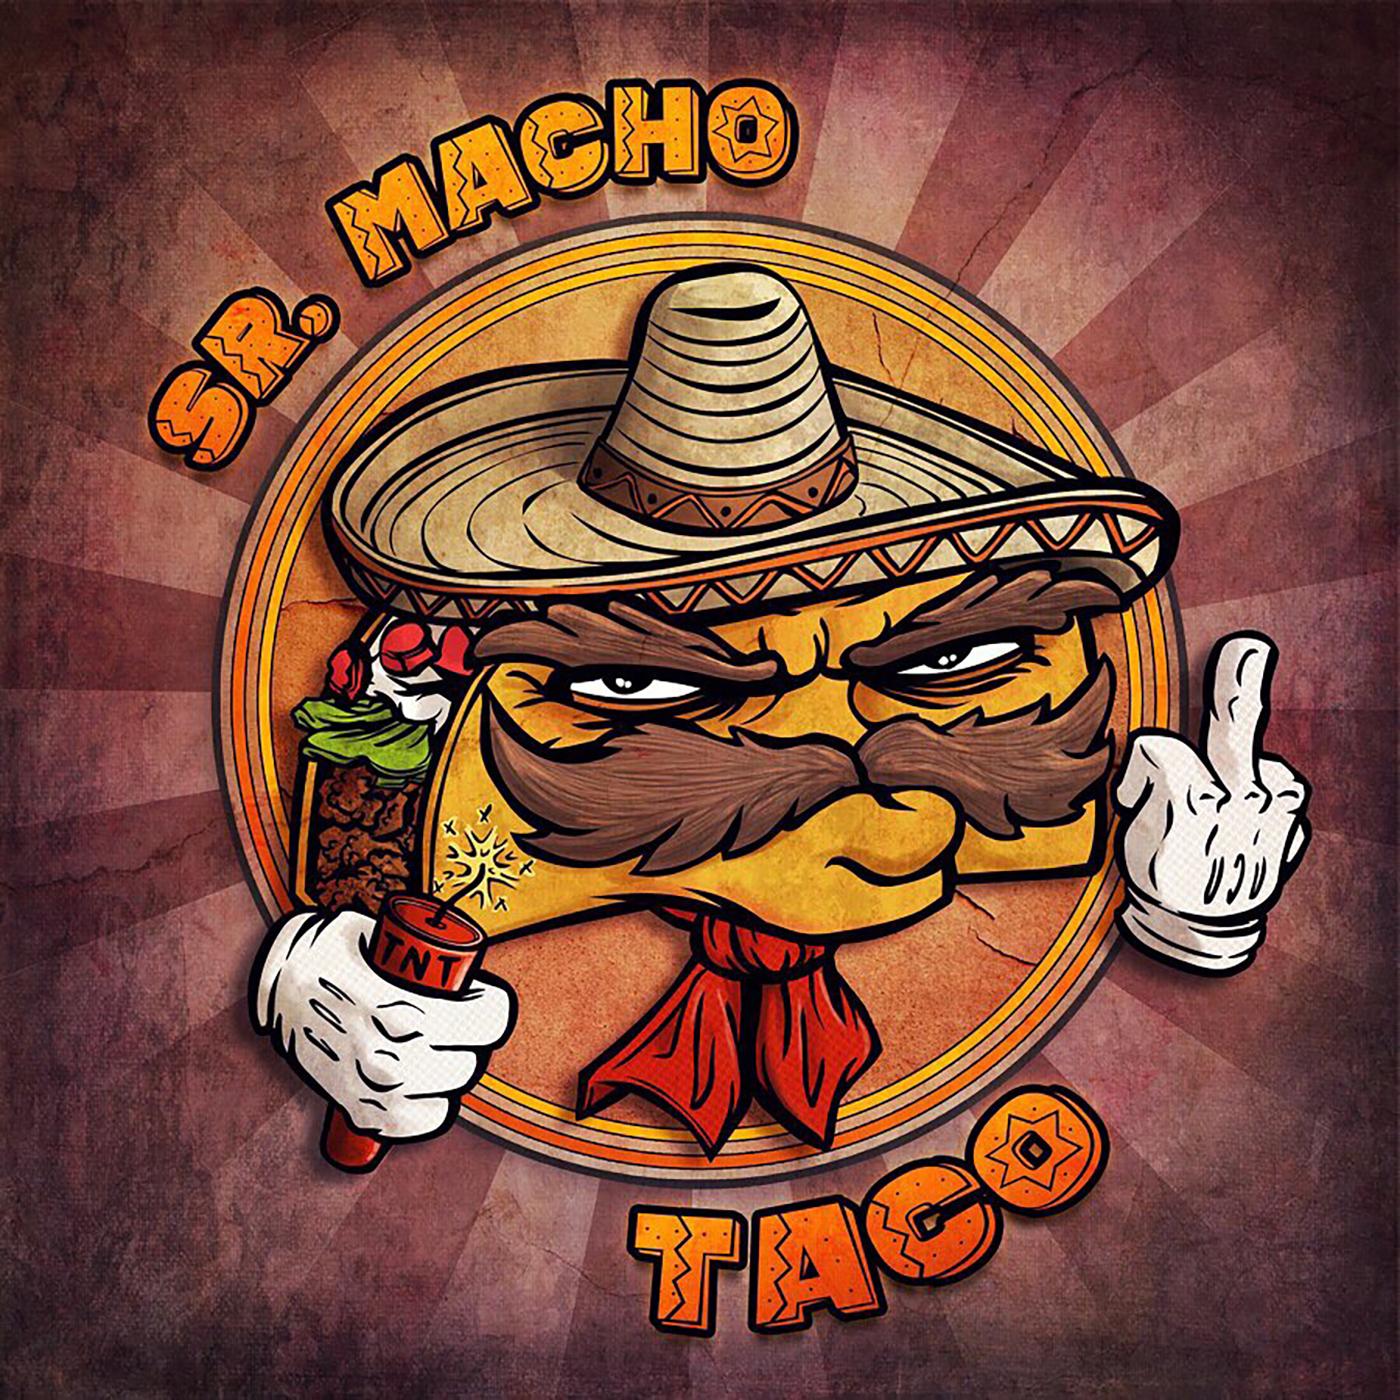 SR. Macho Taco